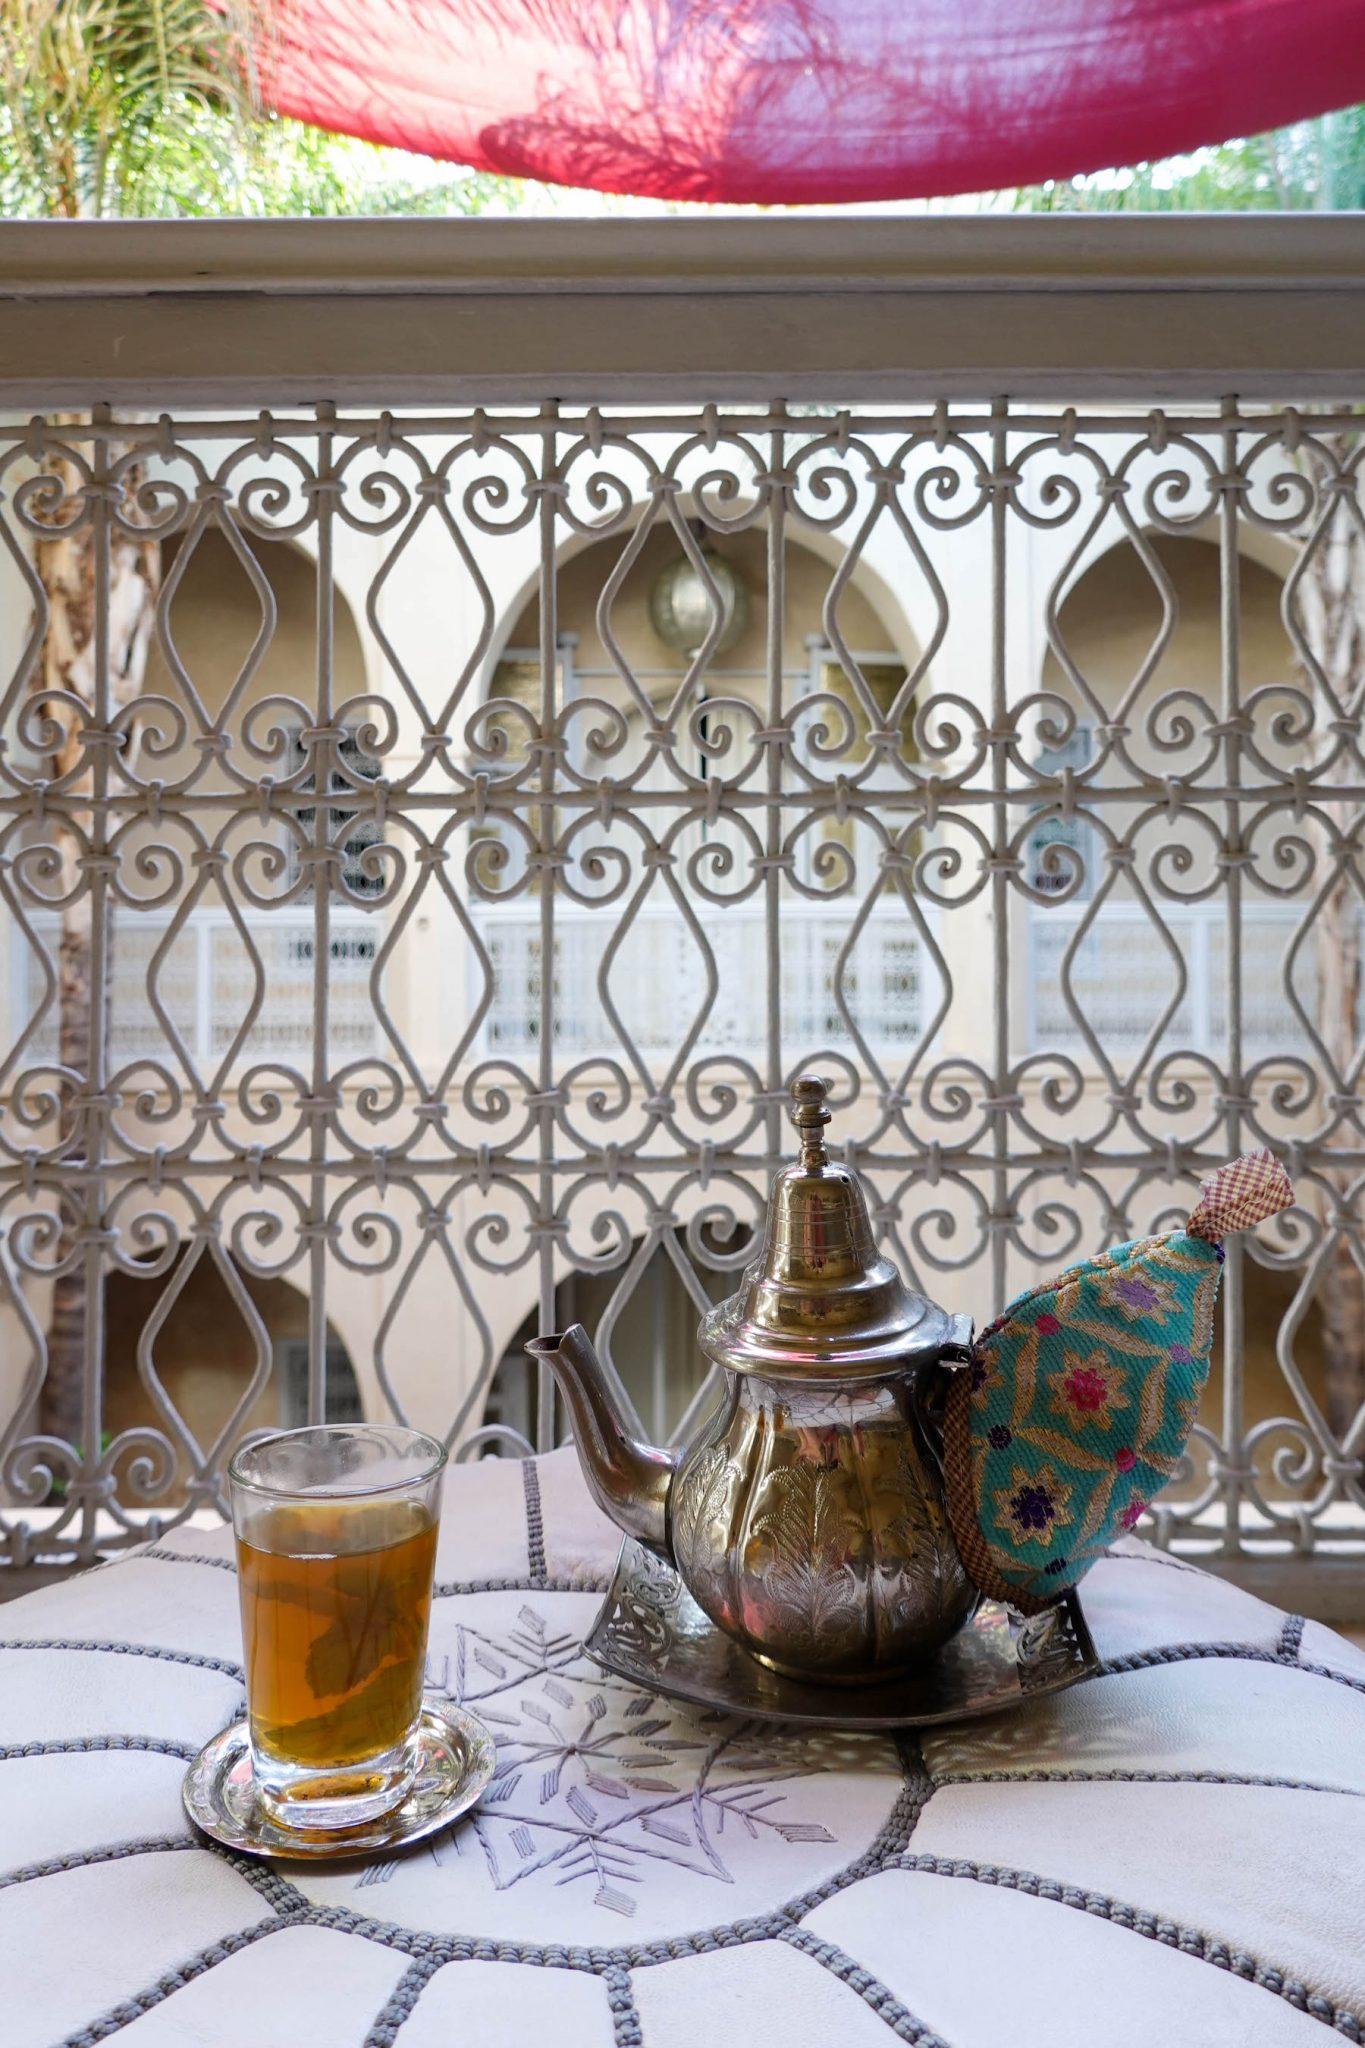 Suelovesnyc_Tipps_Marrakesch_Reise_Marrakech_Marrakesch_Urlaub_marokkanischer_tee_marokkanischer_minztee